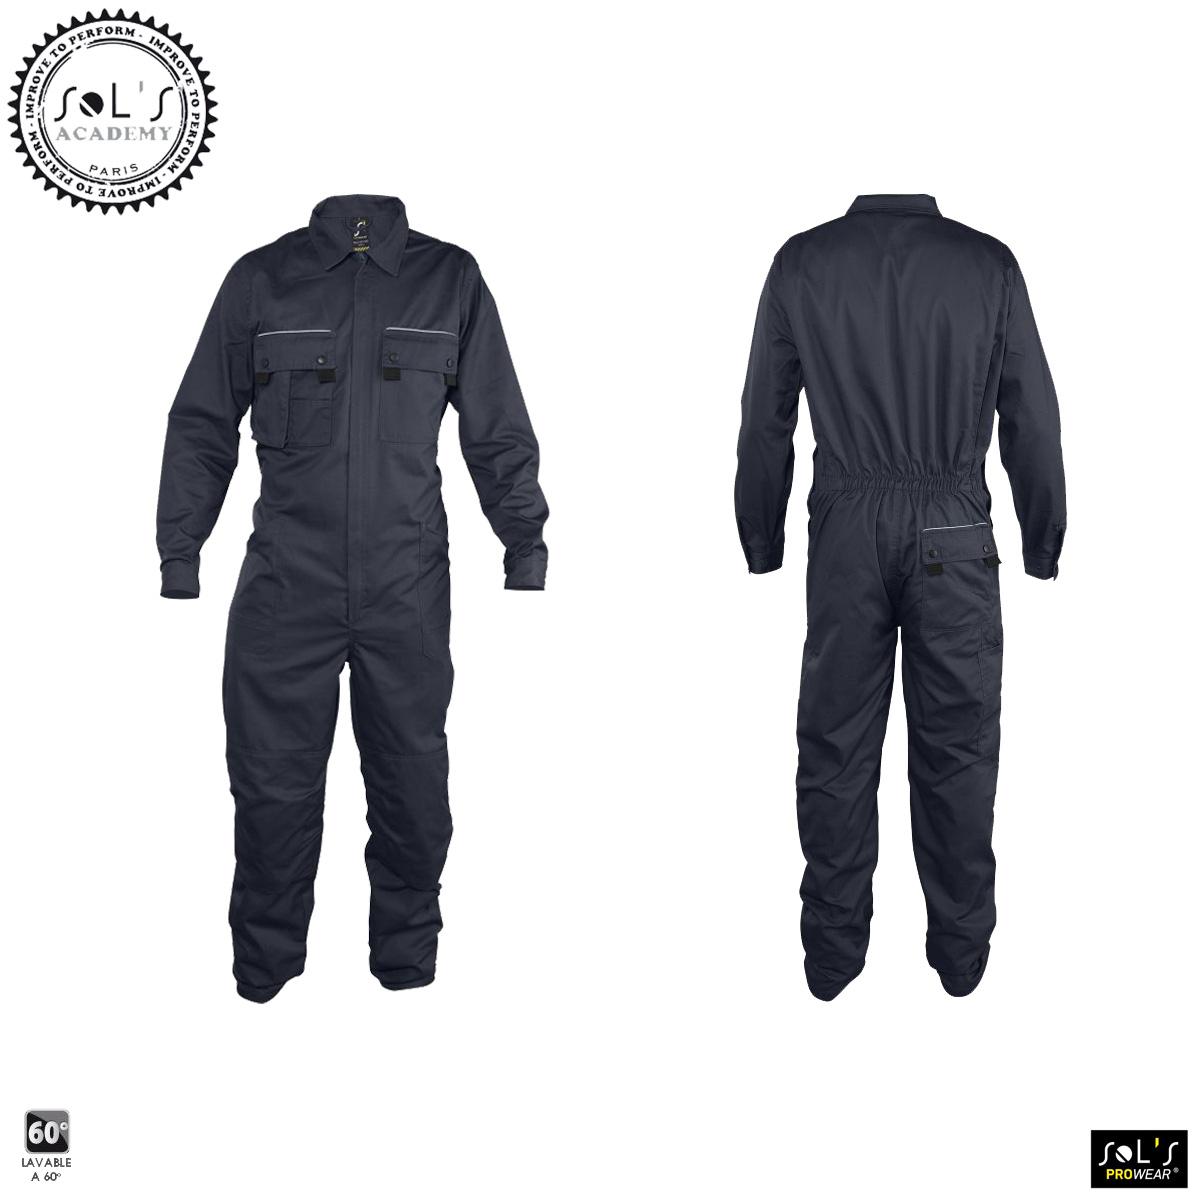 Sols Unisex Workwear Overall Pro Arbeitsoverall Arbeitskleidung Arbeitsanzug Neu